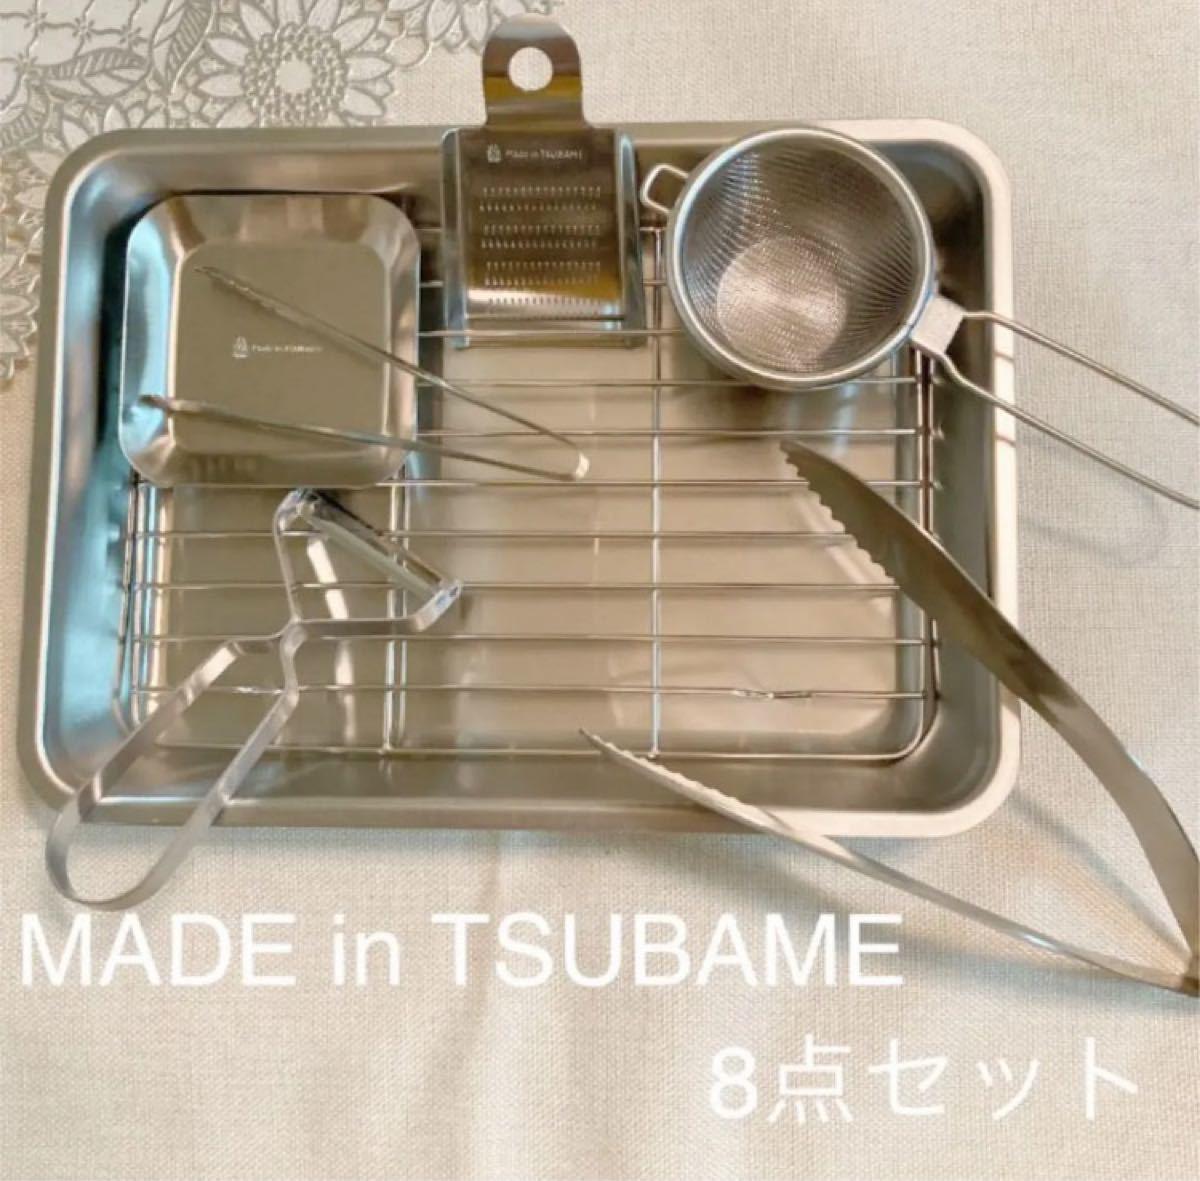 MADE in TSUBAME 8点セット 網付きバット トング おろし金 ピーラー 薬味皿 ミニトング 茶こし 新品 燕三条